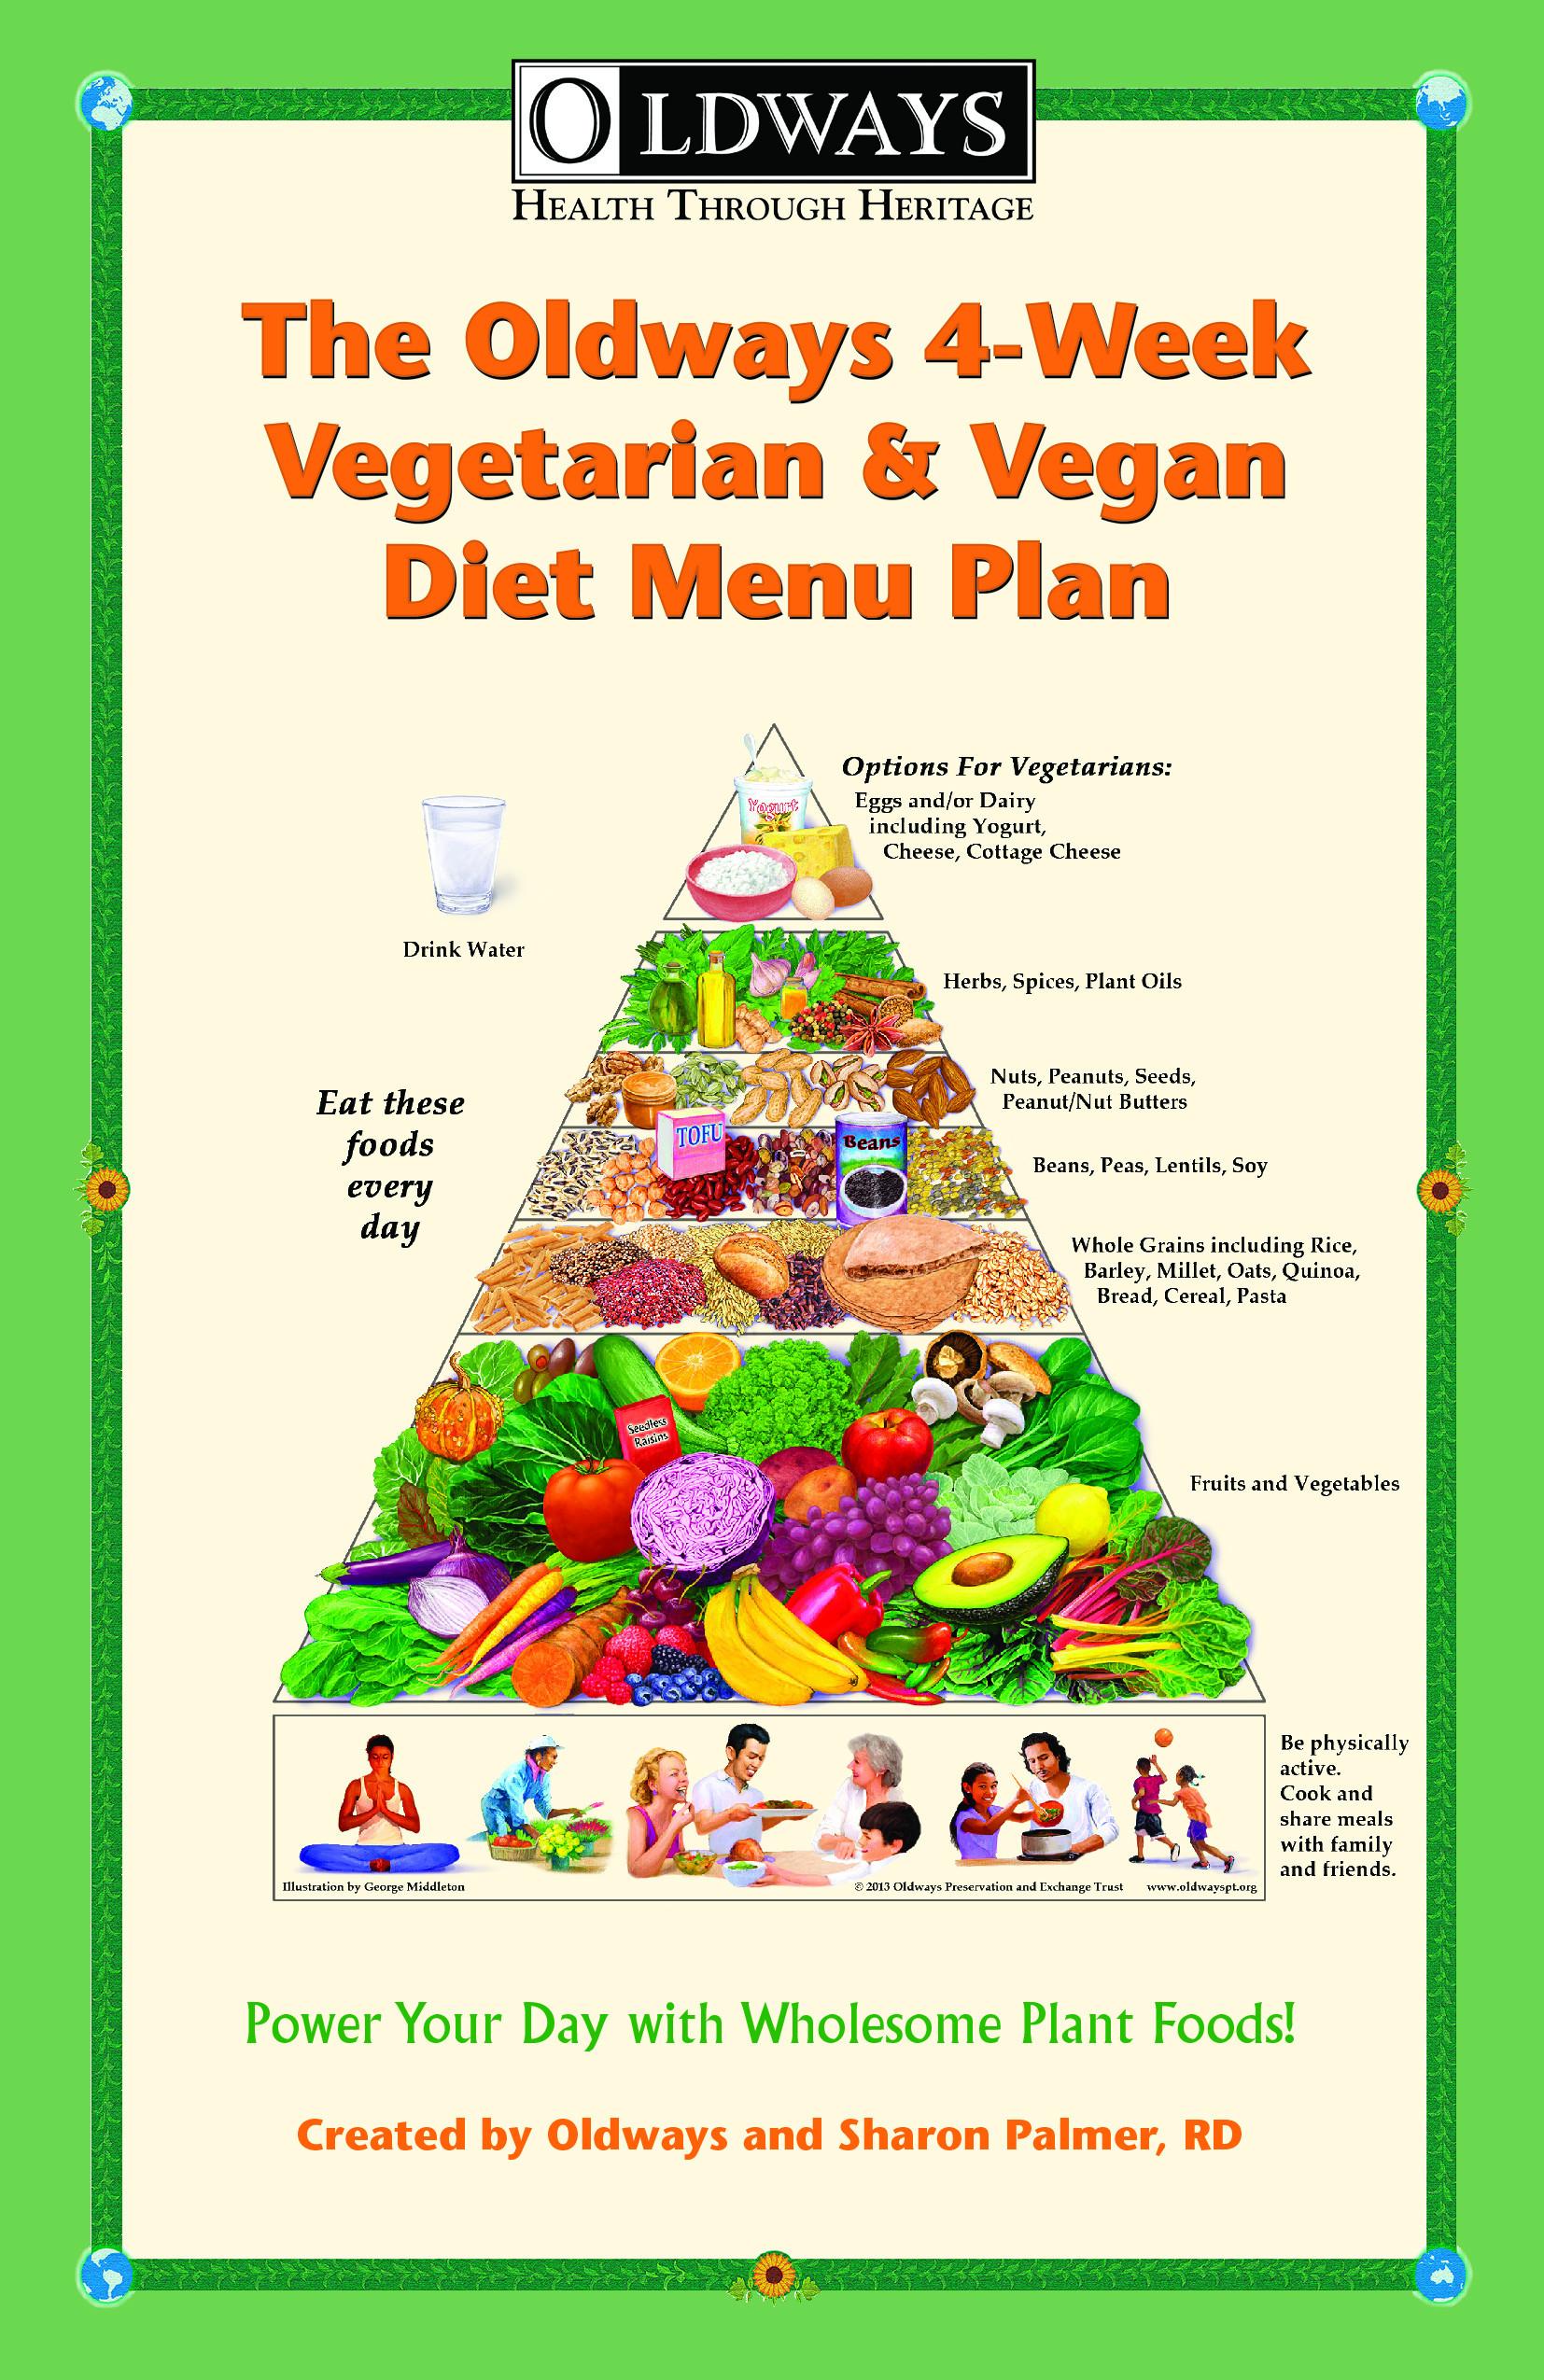 Vegan Plan Menu  The Oldways 4 Week Ve arian & Vegan Diet Menu Plan